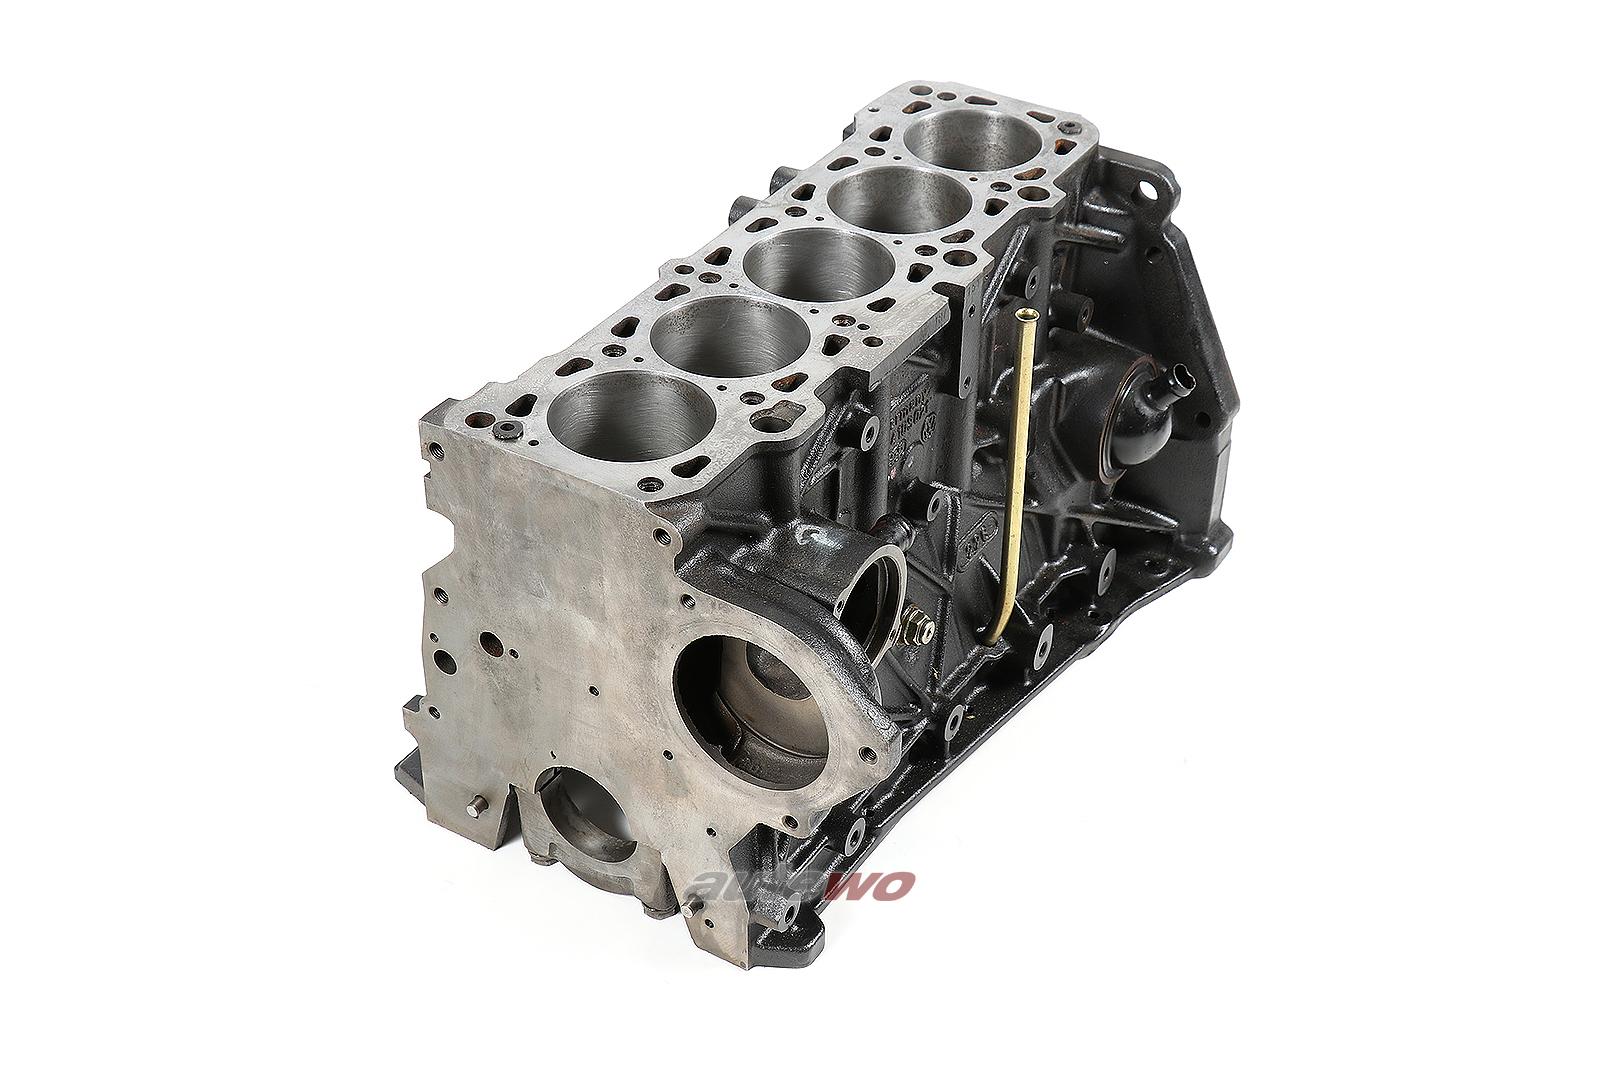 054103021 NEU Audi/VW 90/Coupe Typ 81/85/Passat 32B 5 Zyl. Motorblock 81,5mm